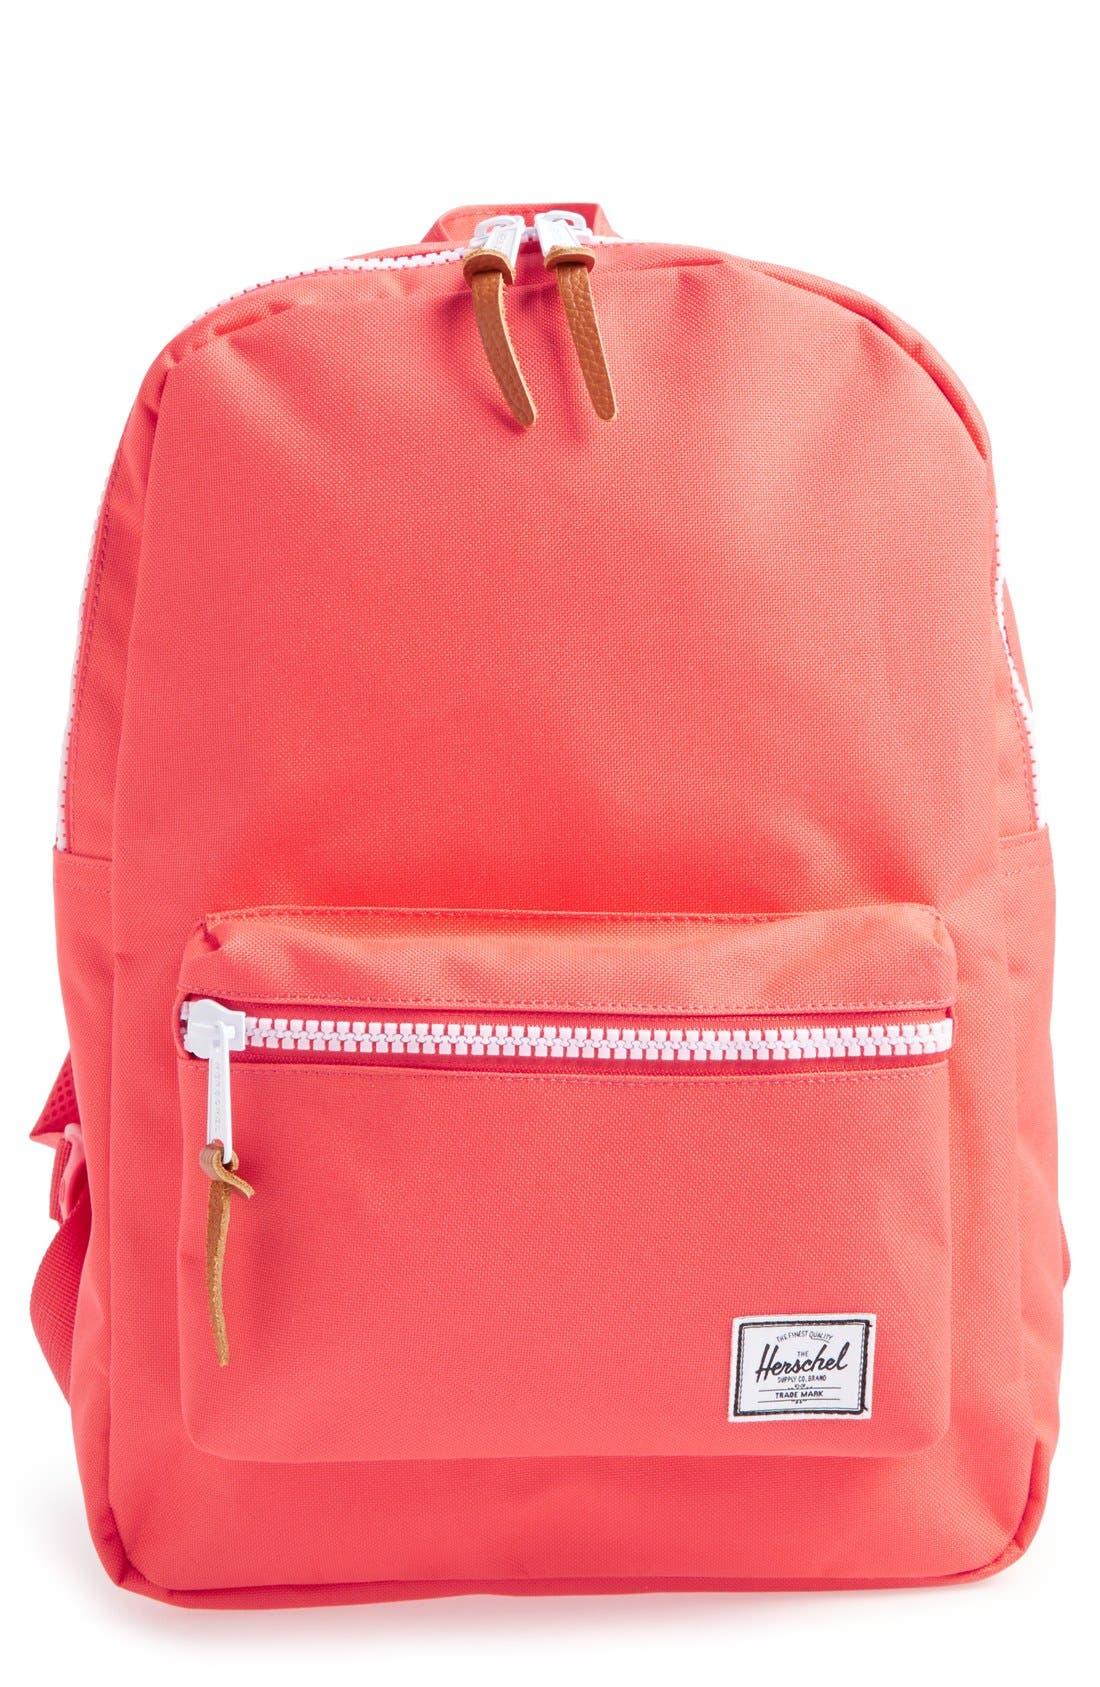 Main Image - Herschel Supply Co. 'Settlement' Backpack (Kids)